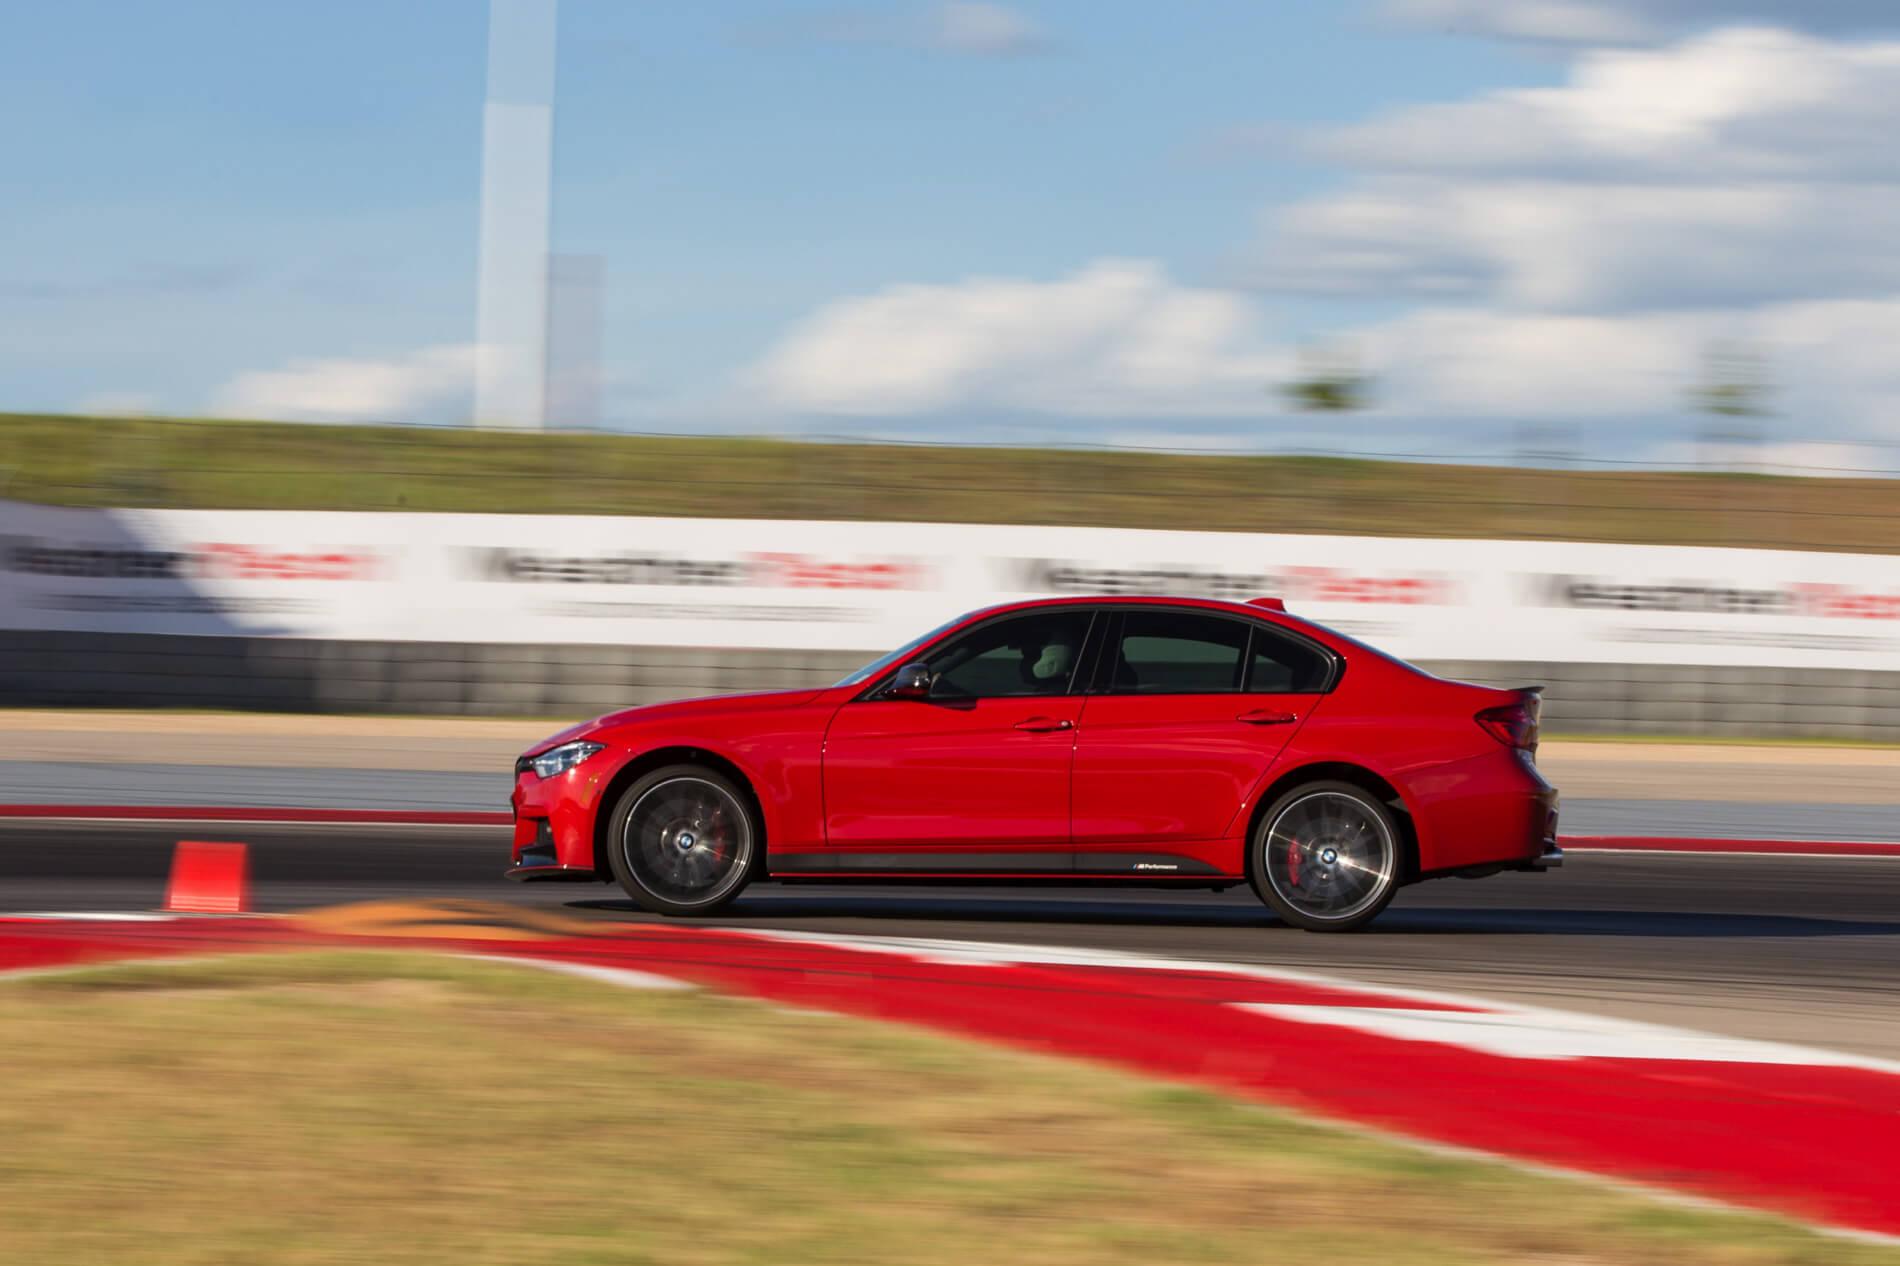 BMW-M-Track-Days-Austin-2017-85.jpg